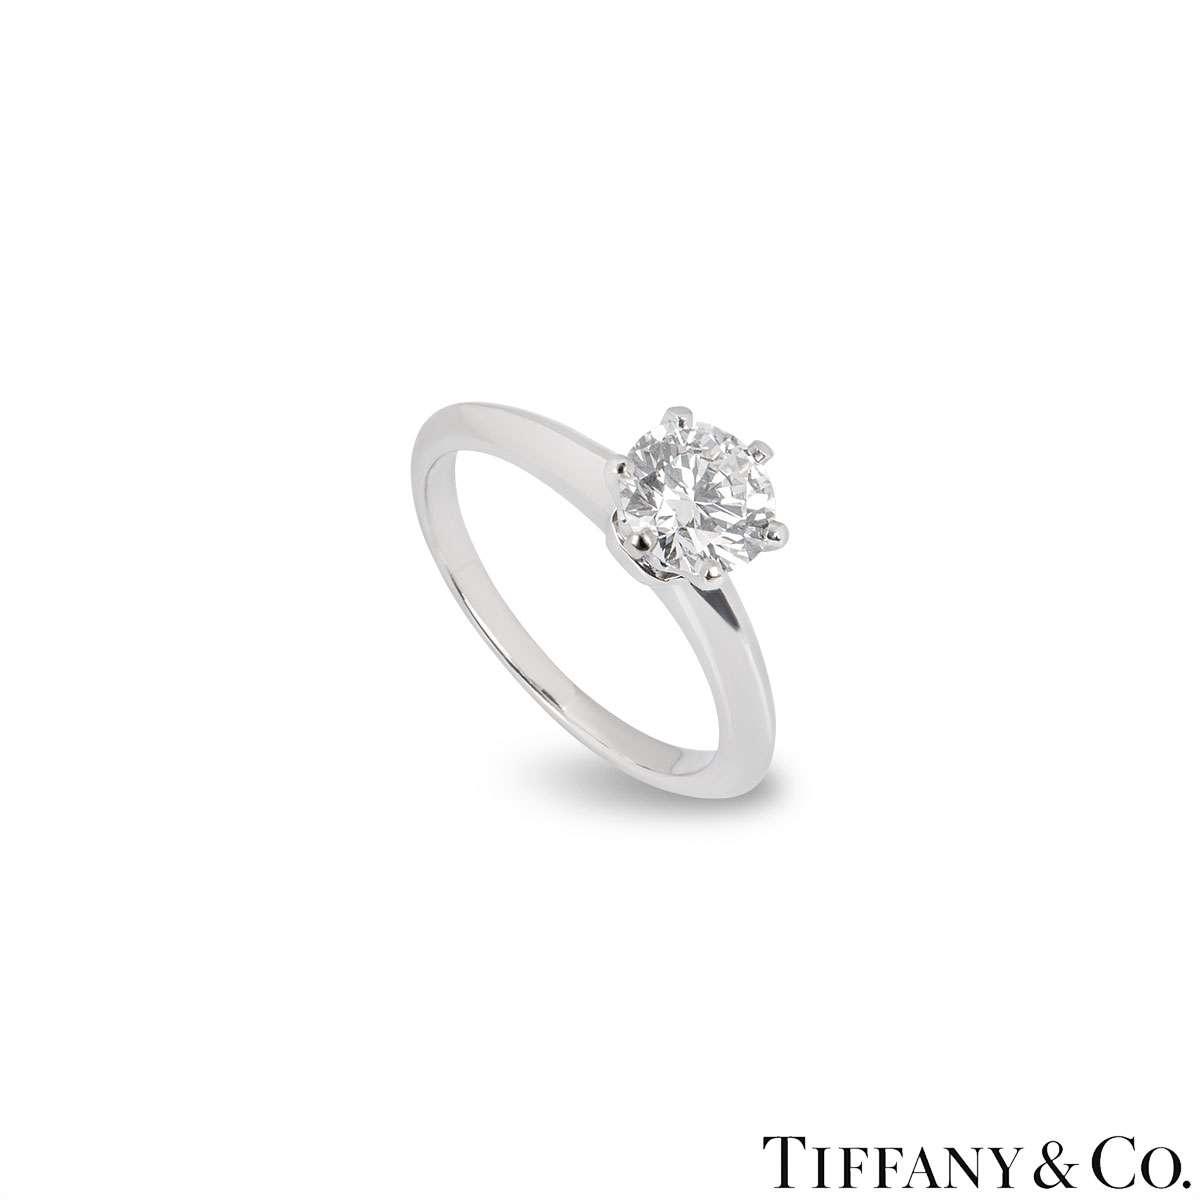 Tiffany & Co. Round Brilliant Cut Diamond Ring 0.99ct I/VVS1